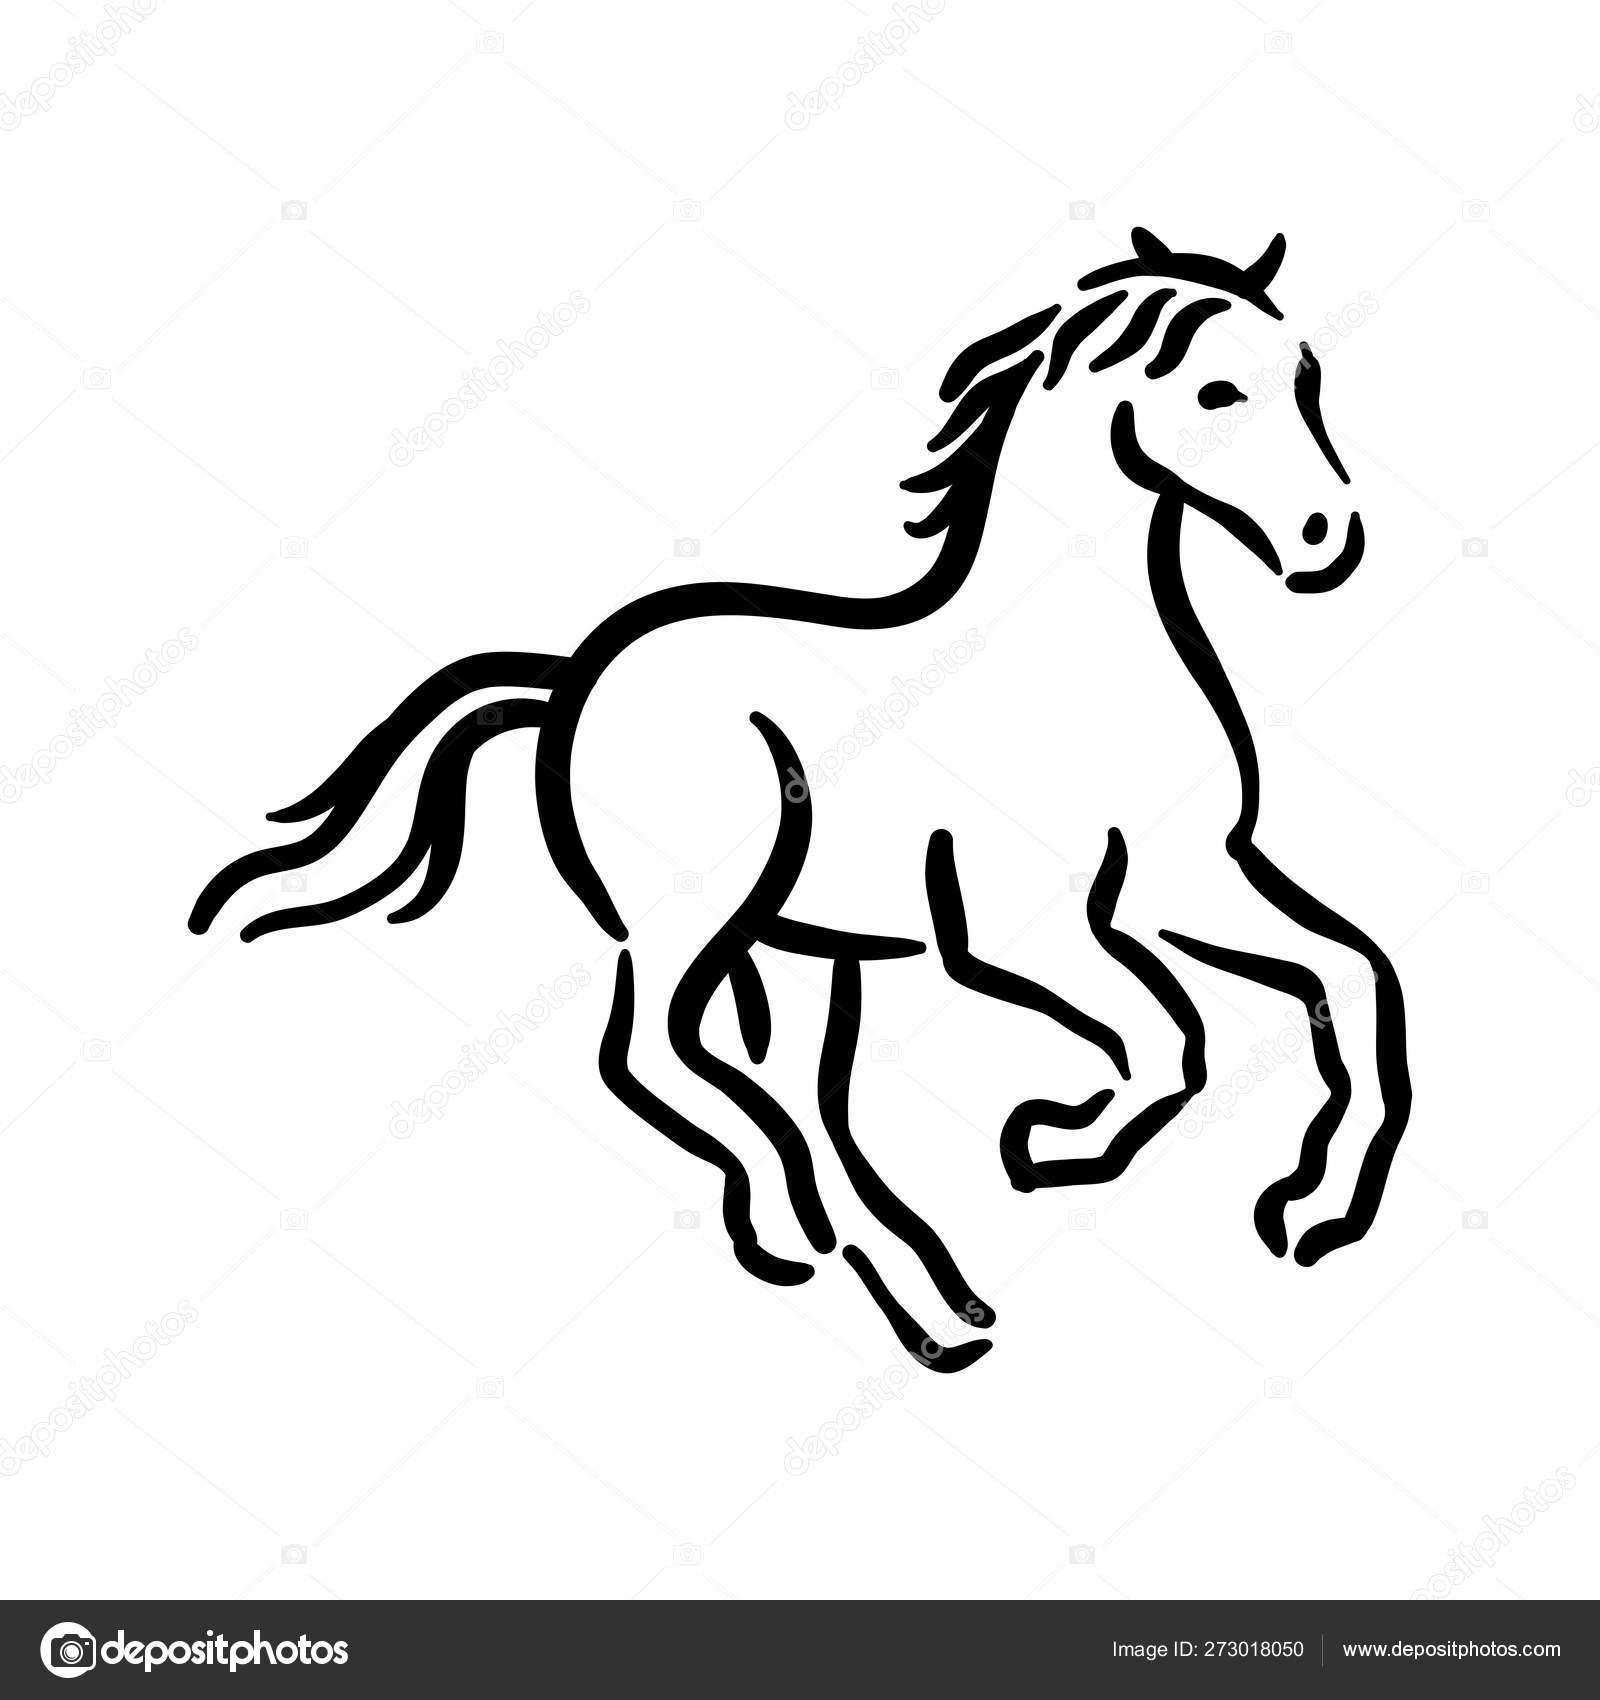 Horse Symbol Illustration Black On White Background Stock Vector C Arthadesignstudio 273018050